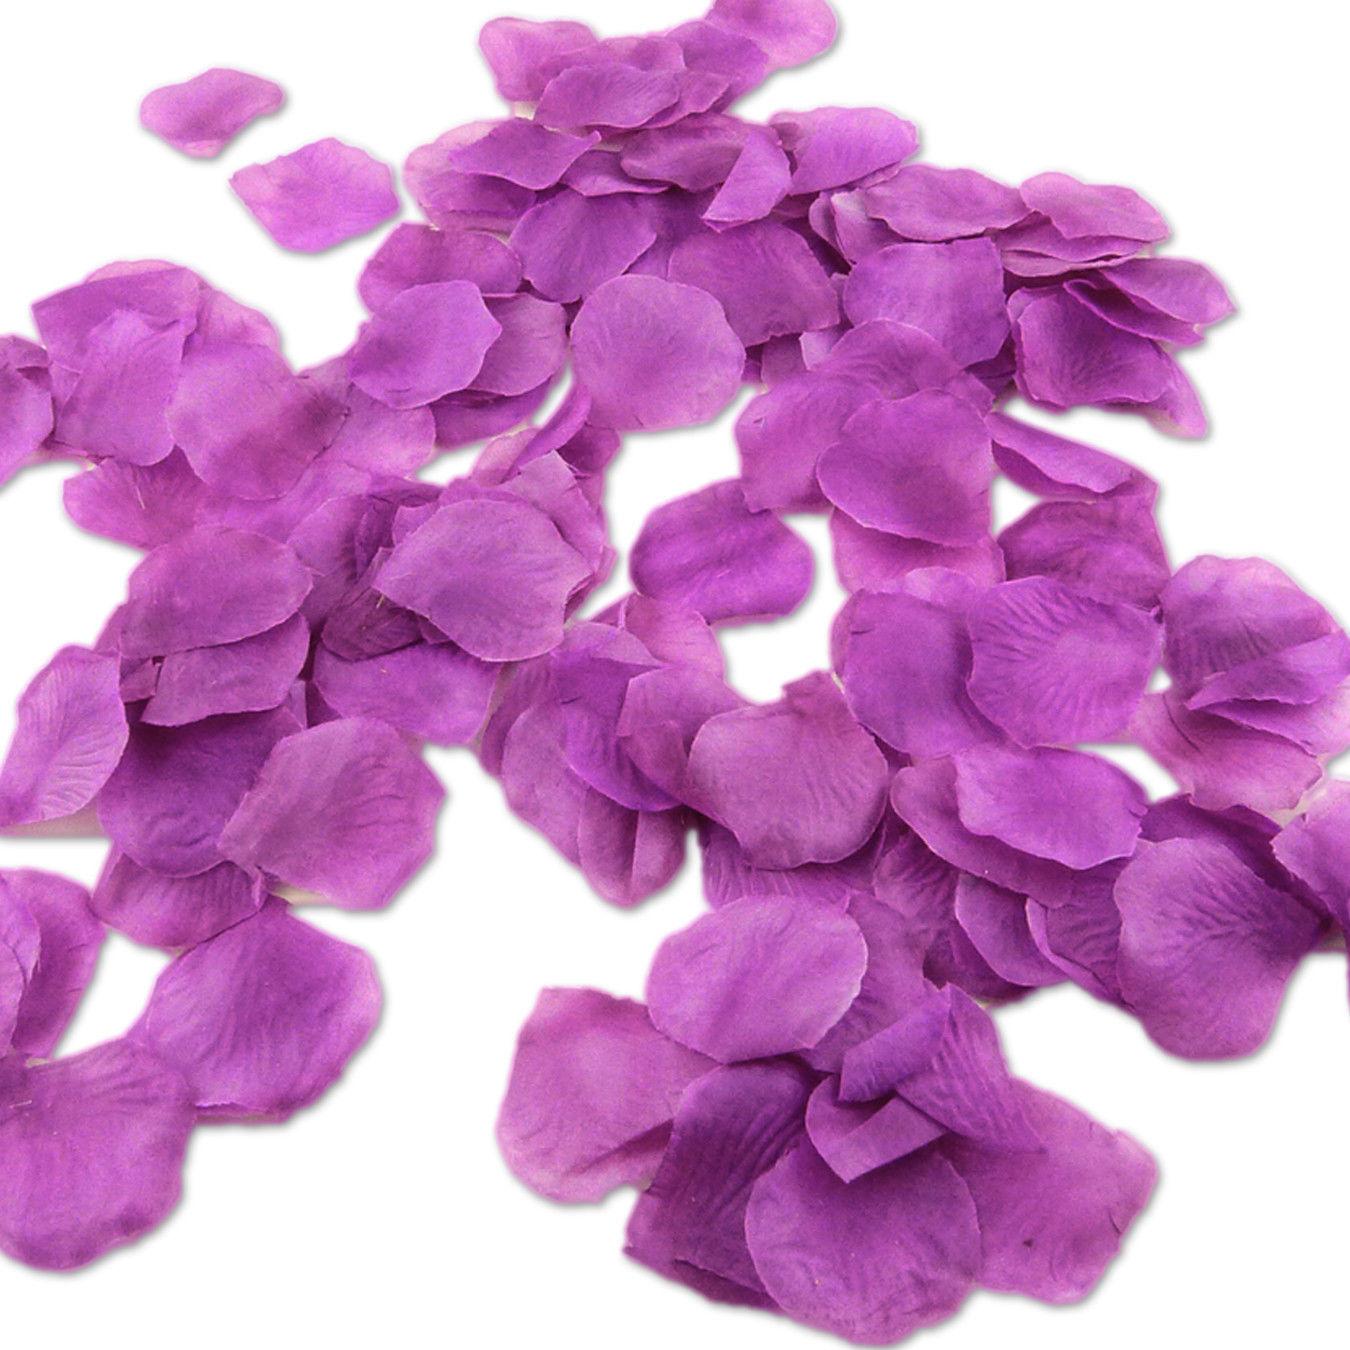 silk rose petals wedding aisle table decor flower party. Black Bedroom Furniture Sets. Home Design Ideas